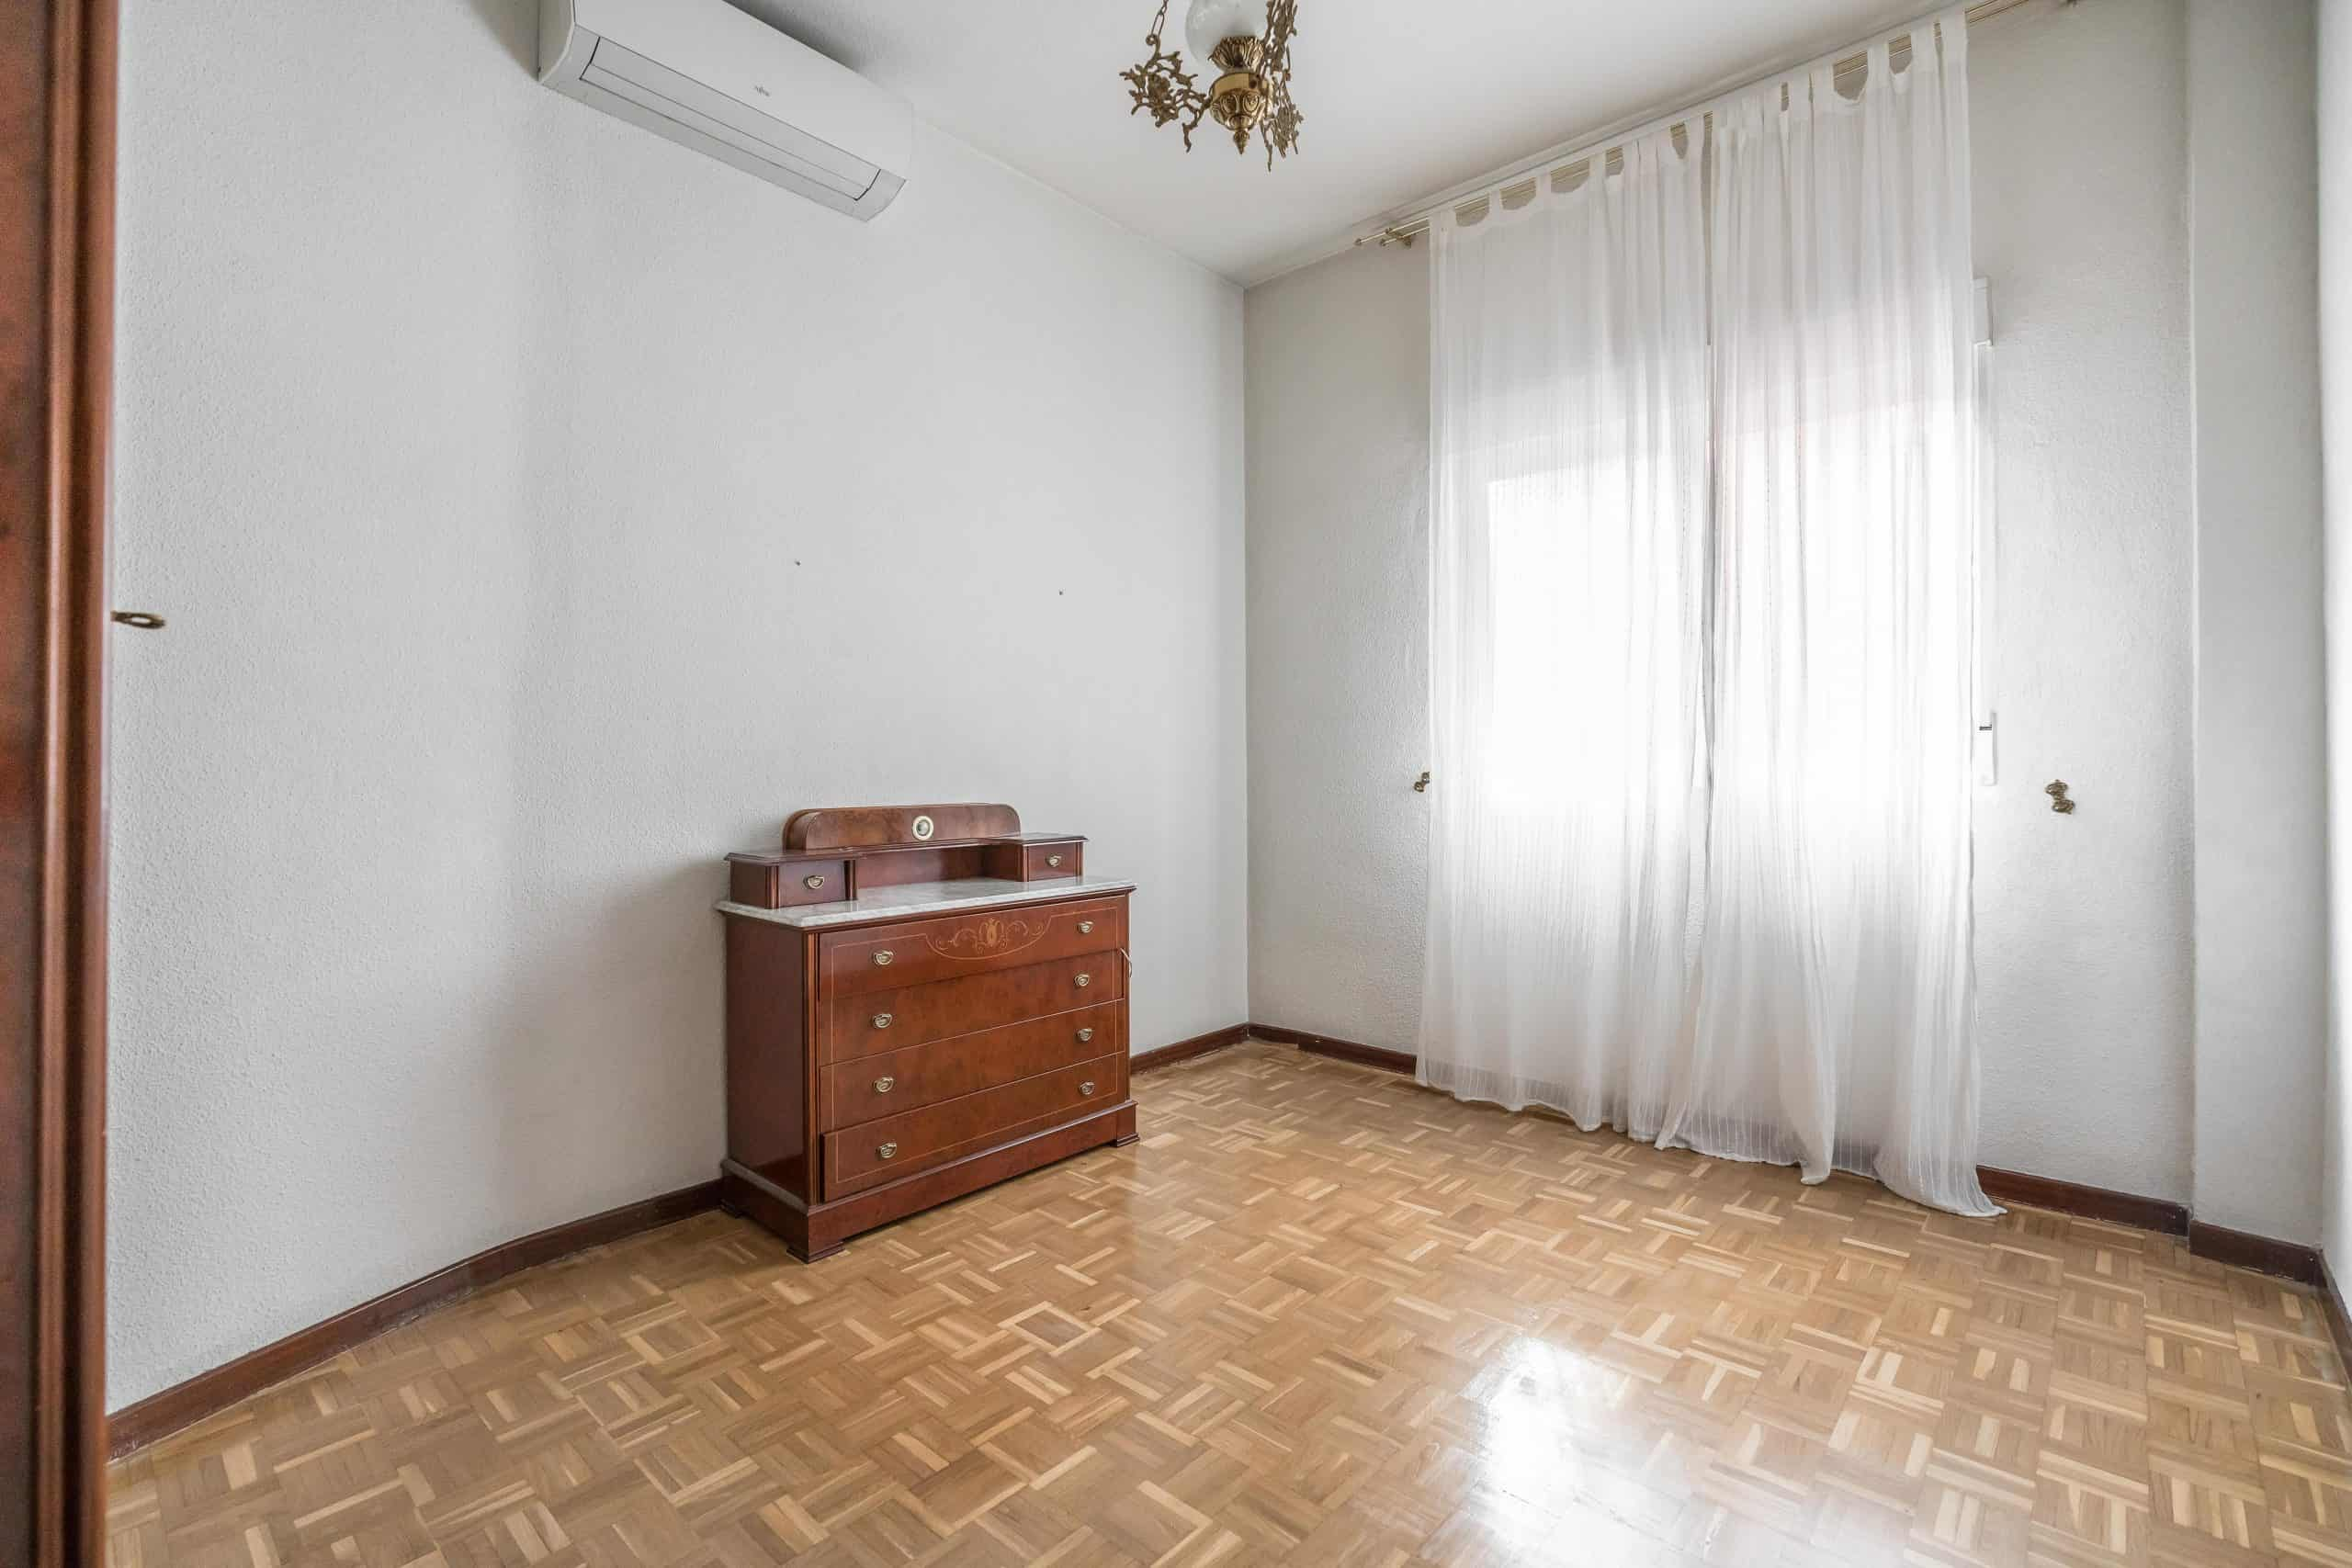 Agencia Inmobiliaria de Madrid-FUTUROCASA-Zona ARGANZUELA-LEGAZPI -calle Jaime Conquistador 48- 1er dormitorio 1